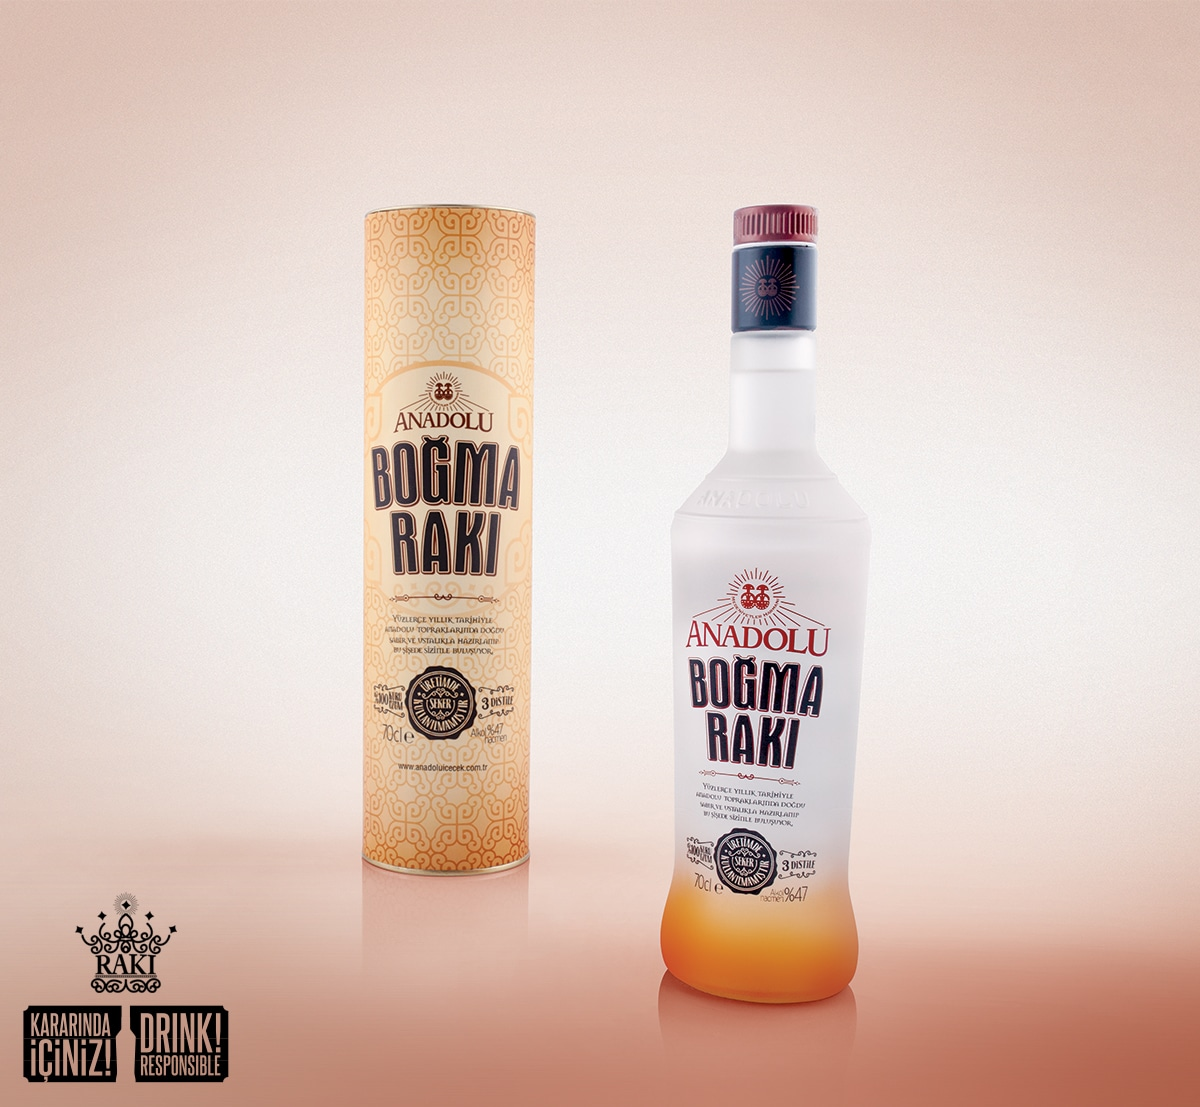 Anadolu Boğma Raki contains 37% alcohol by volume